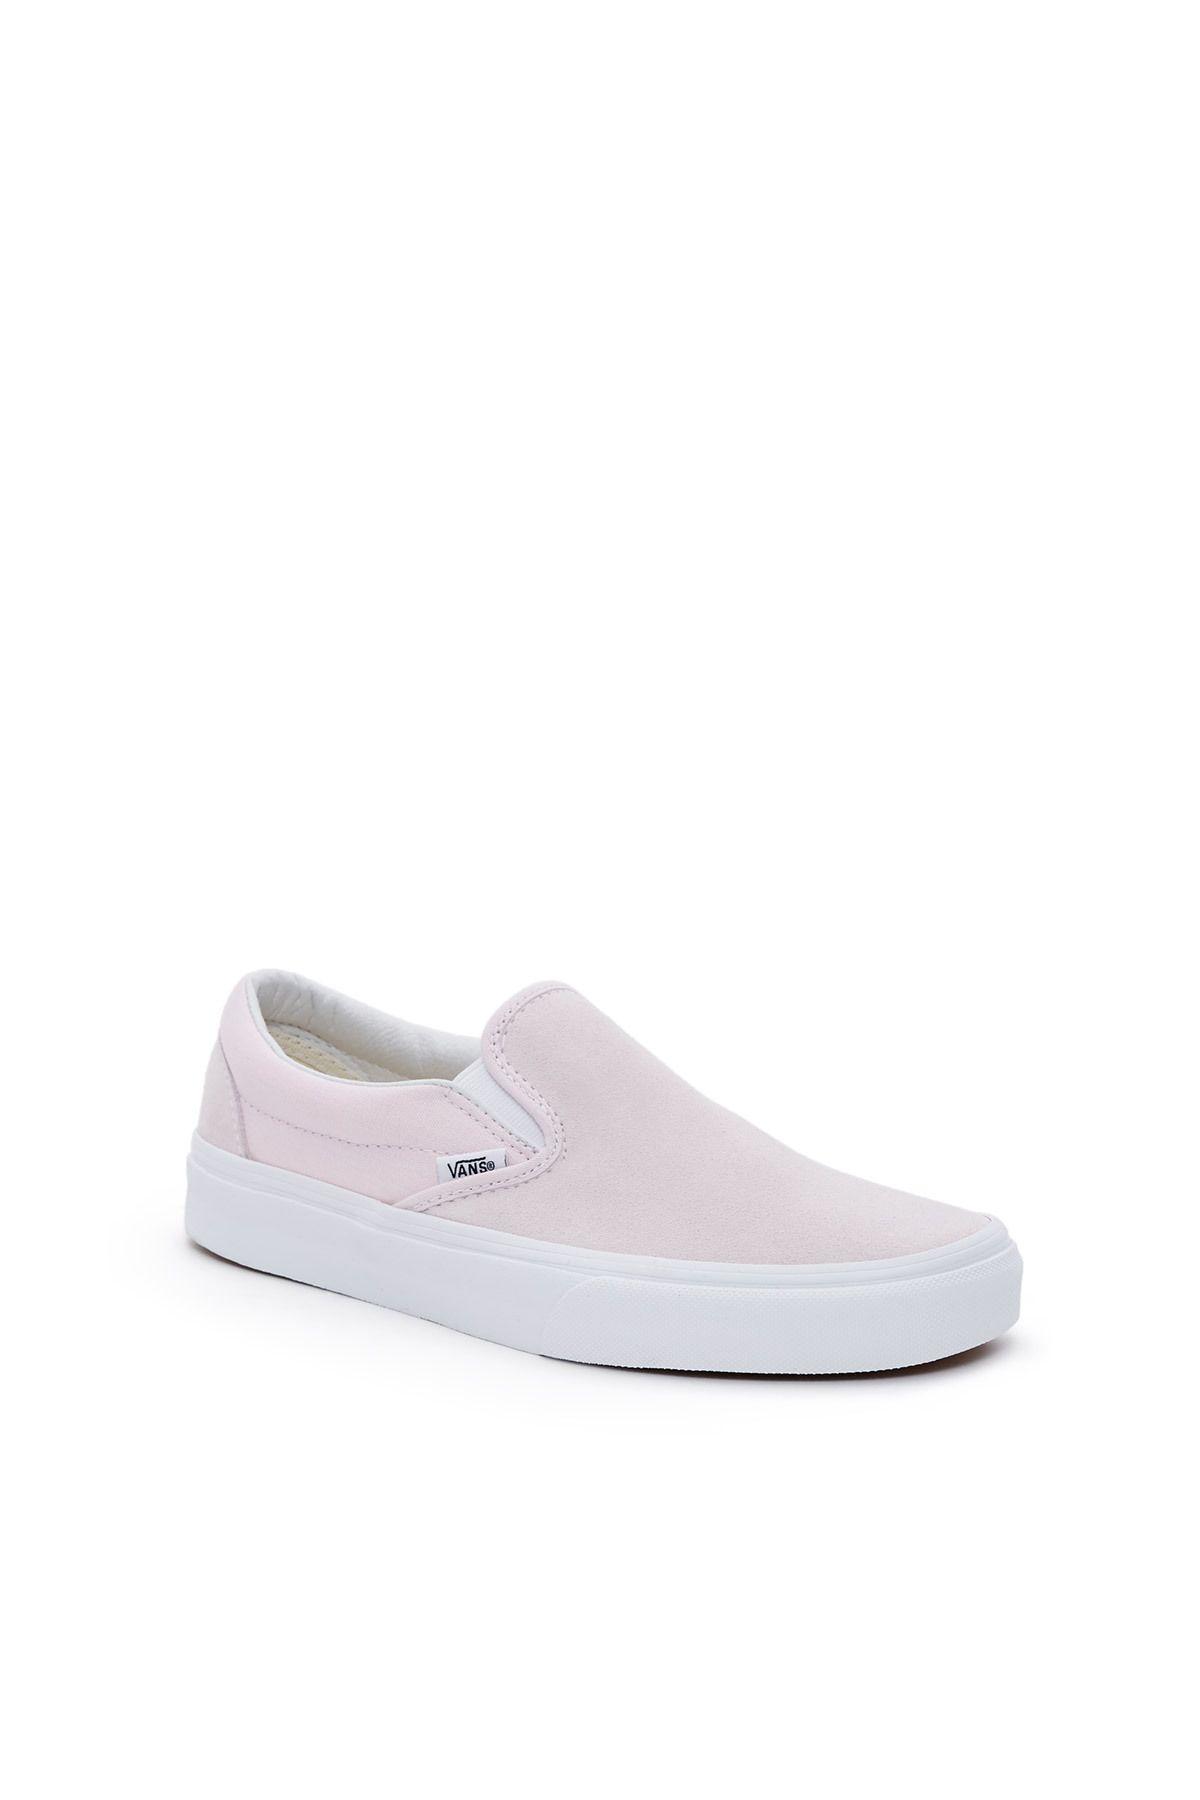 Vans, Pastel Classic Slip-On Sneaker